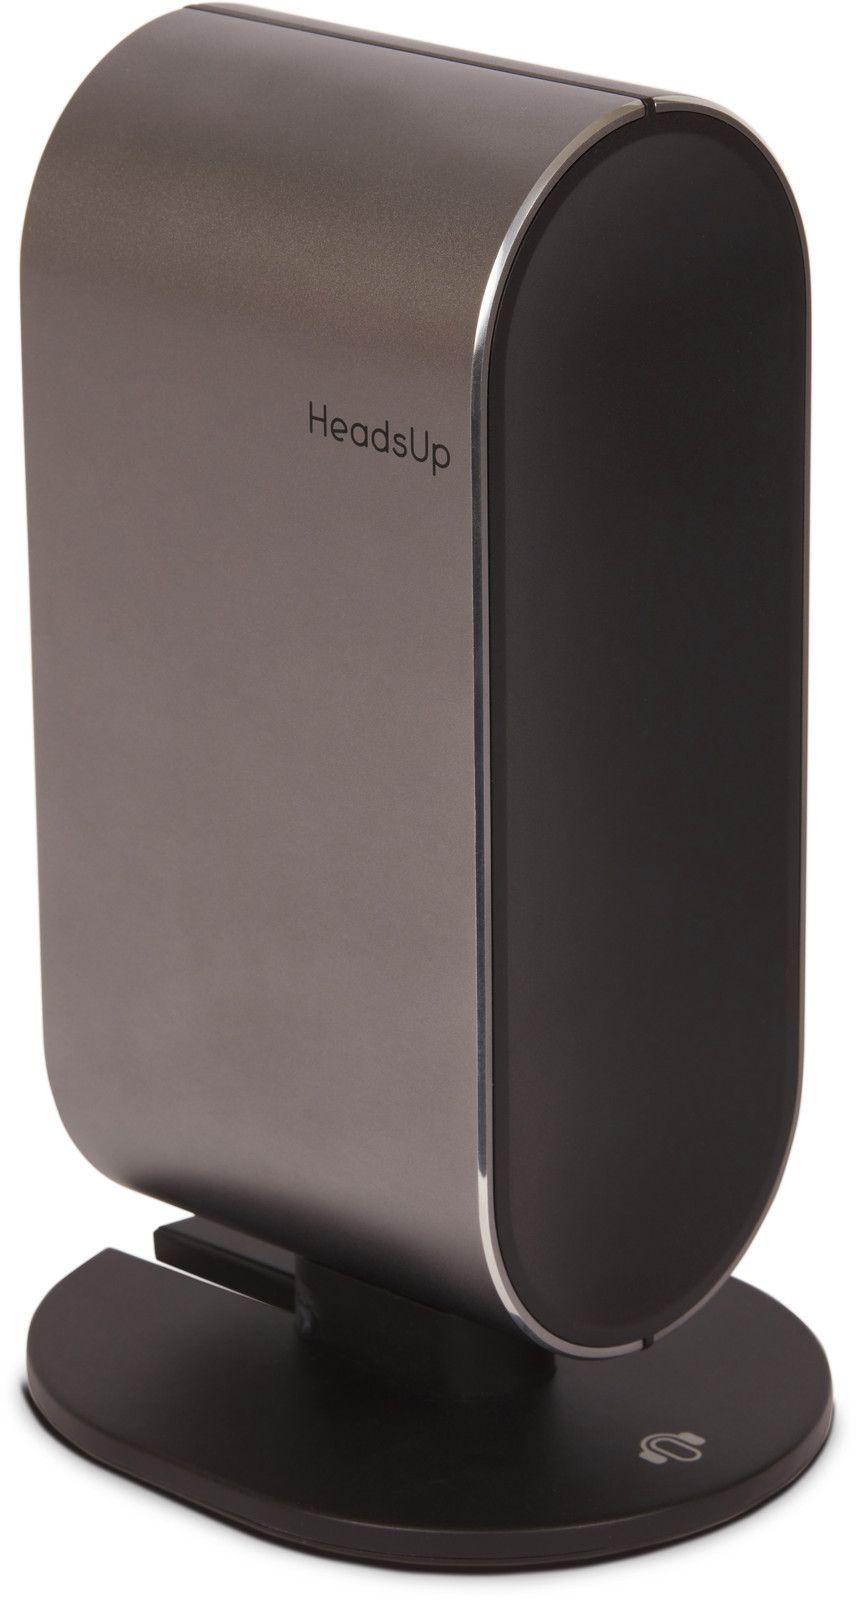 HeadsUp Premium Table Stand